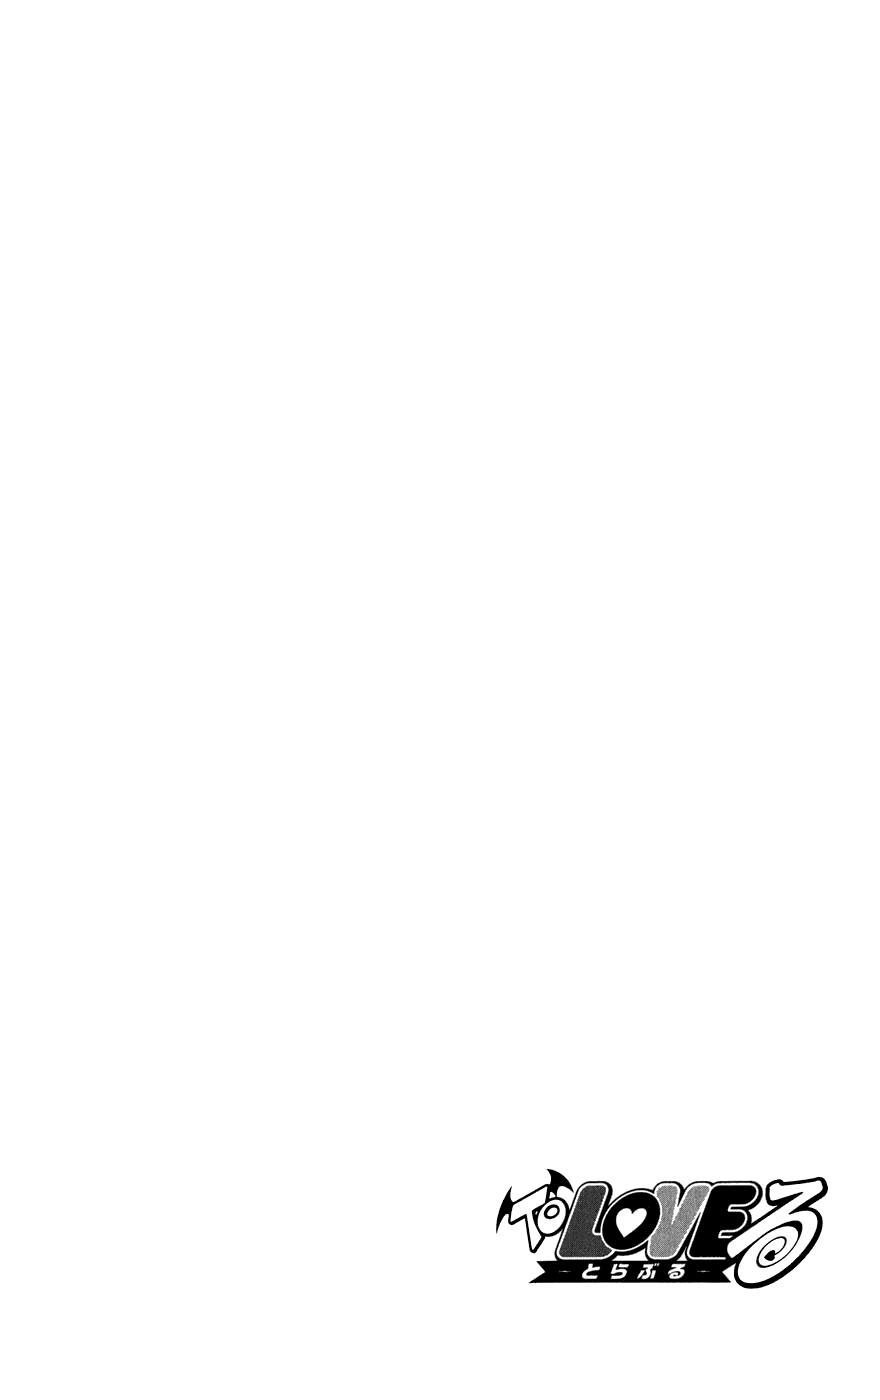 Манга Любовные неприятности / To Love-Ru  - Том 8 Глава 65 Страница 20